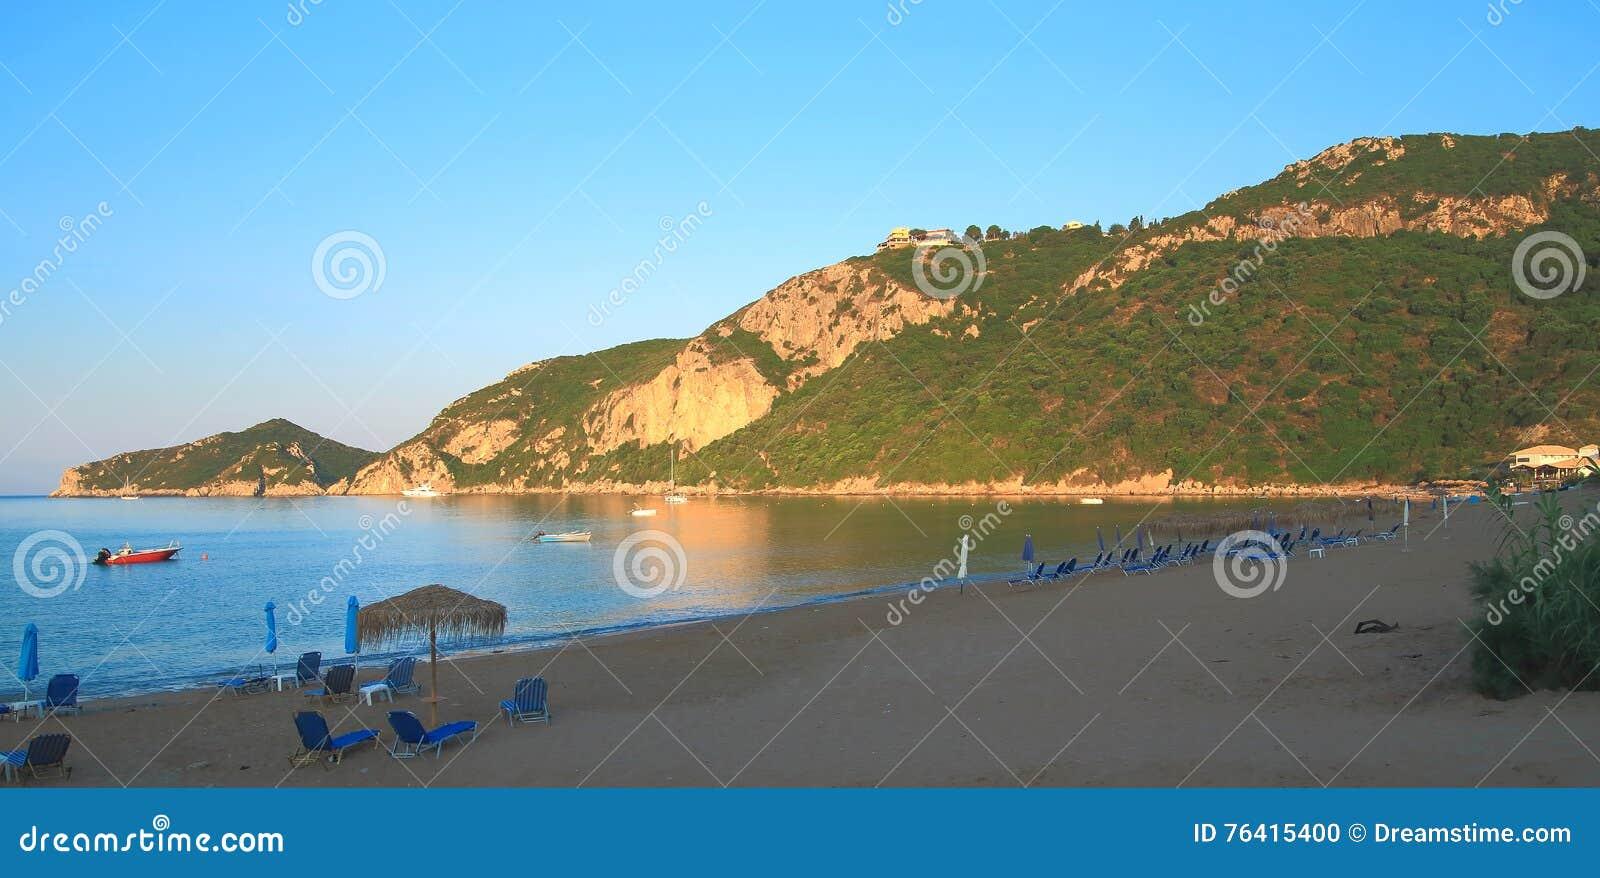 Ranek na plaży ażio Georgios Pagon na Corfu wyspie